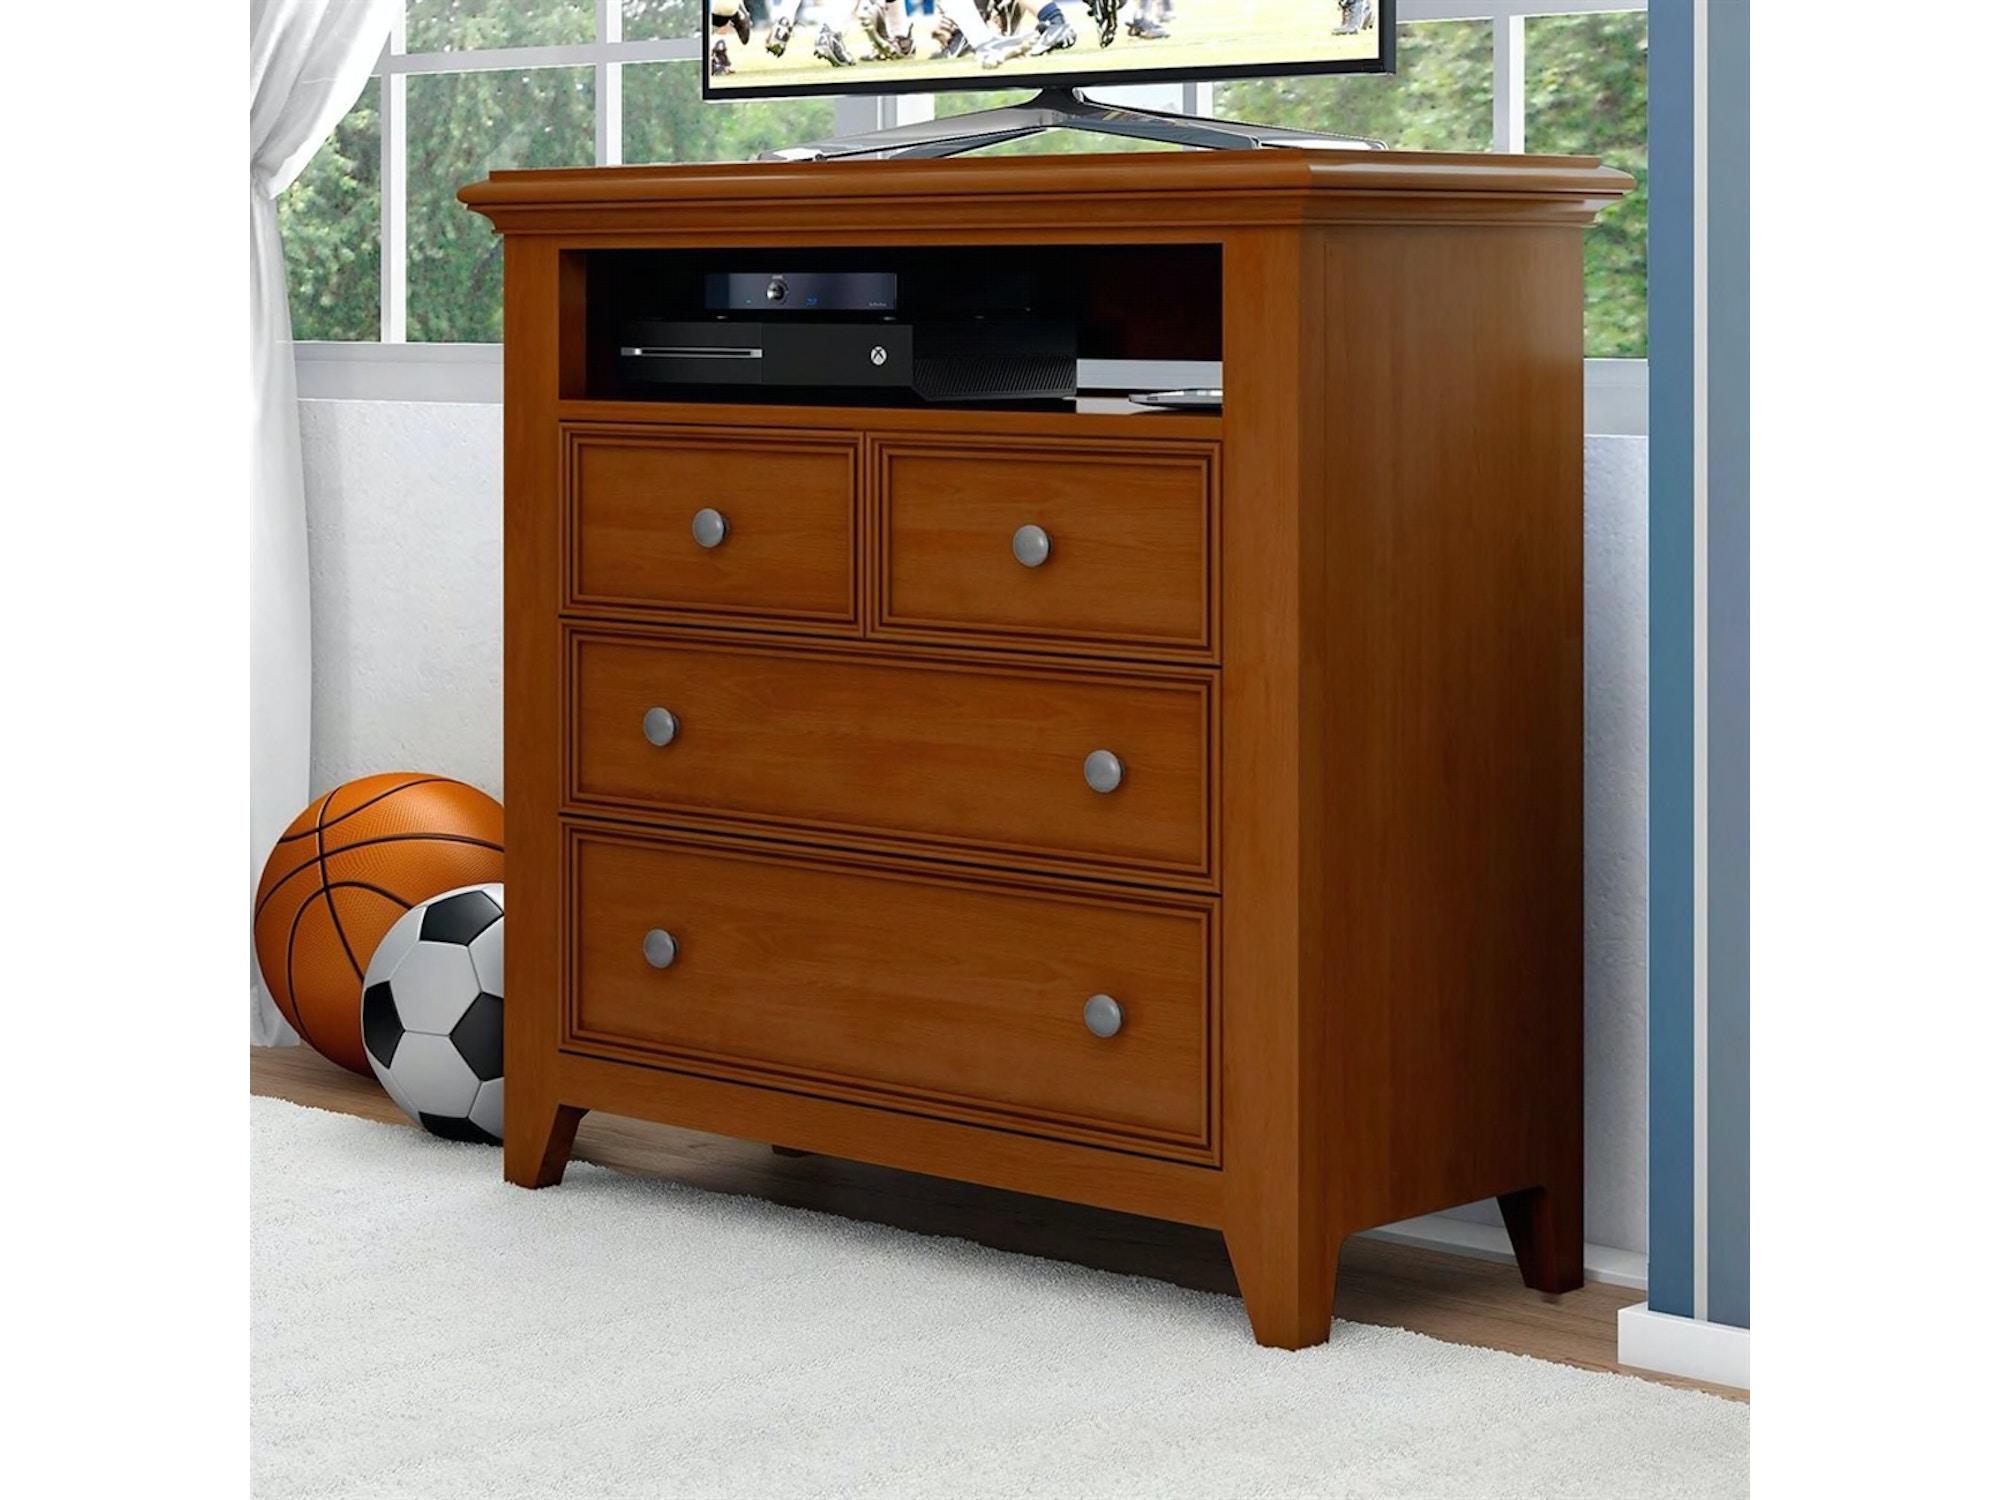 Bedroom Chests and Dressers - Furniture Fair - Cincinnati & Dayton ...